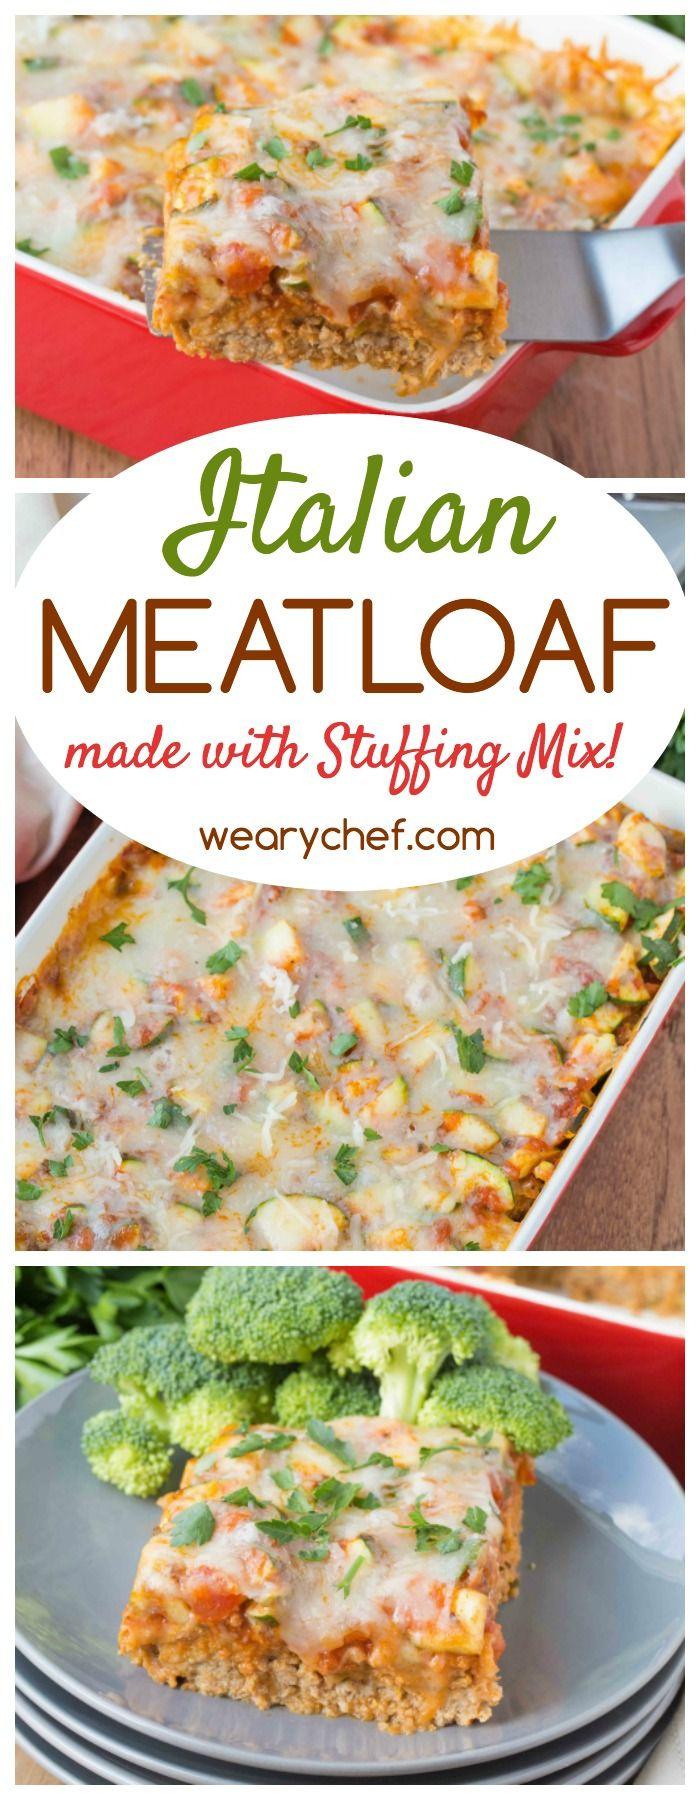 Best 25+ Stuffing mix ideas on Pinterest | Stuffing mix recipes ...